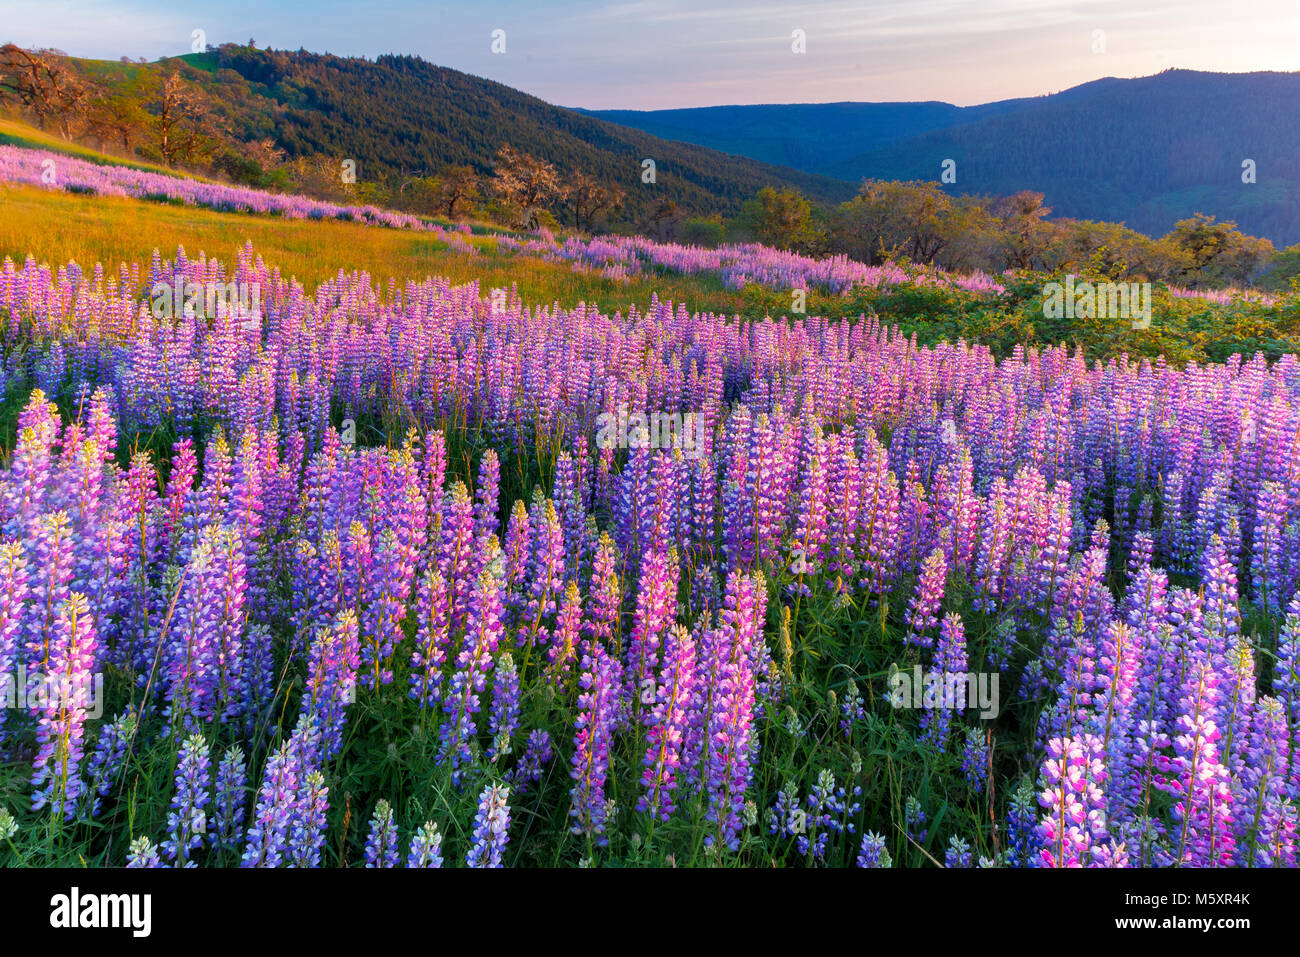 Tramonto, Lupin, Childs Hill Prairie, Parco Nazionale di Redwood in California Immagini Stock